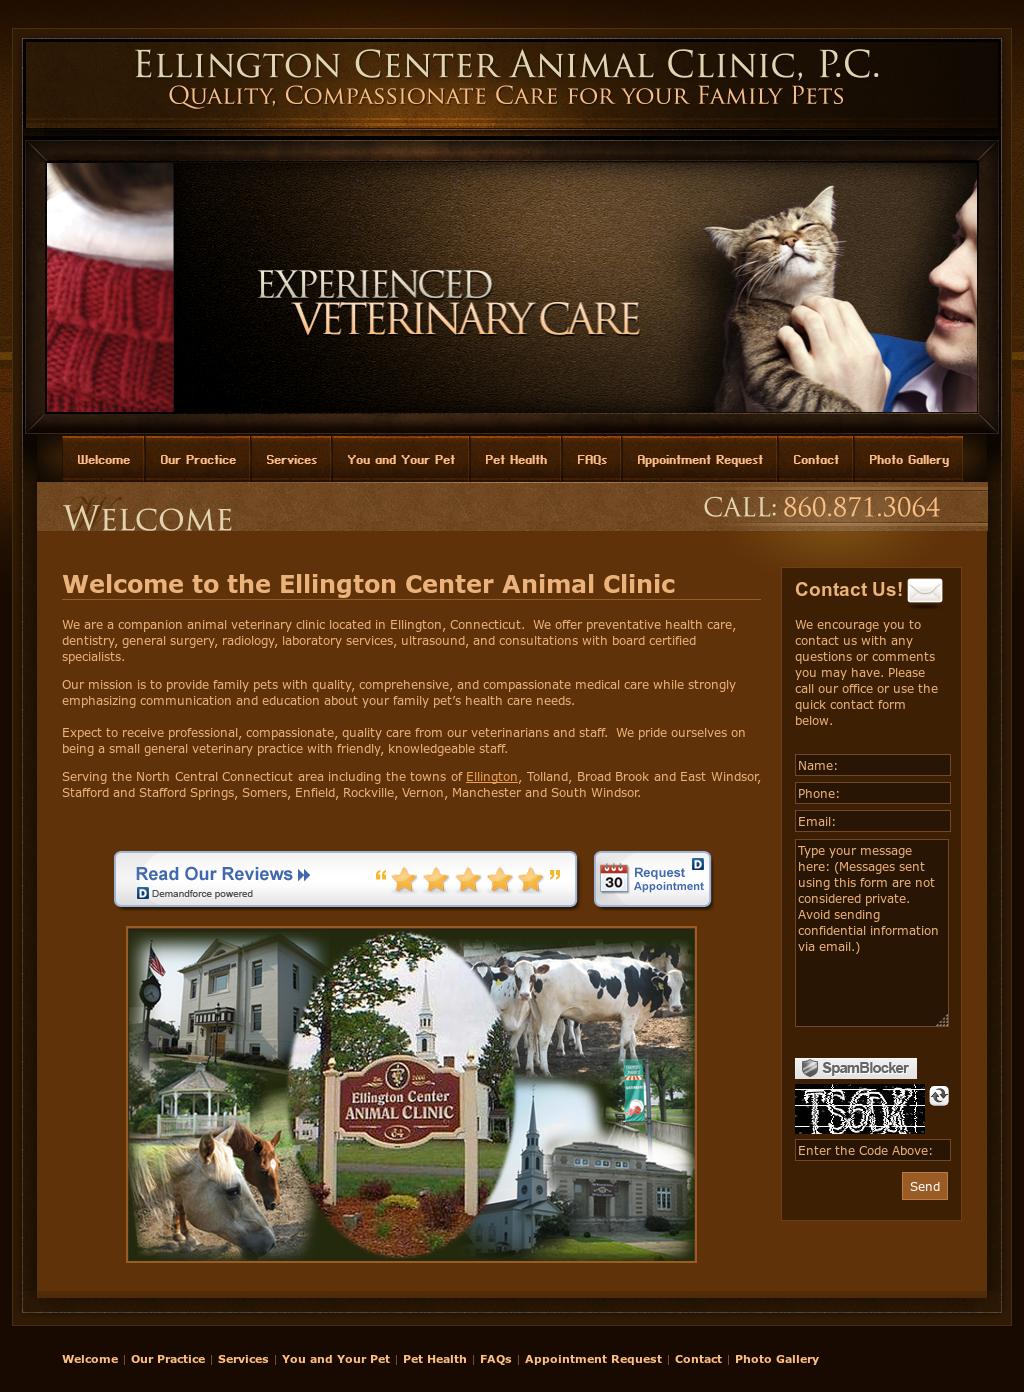 Ellington Center Animal Clinic Competitors, Revenue and